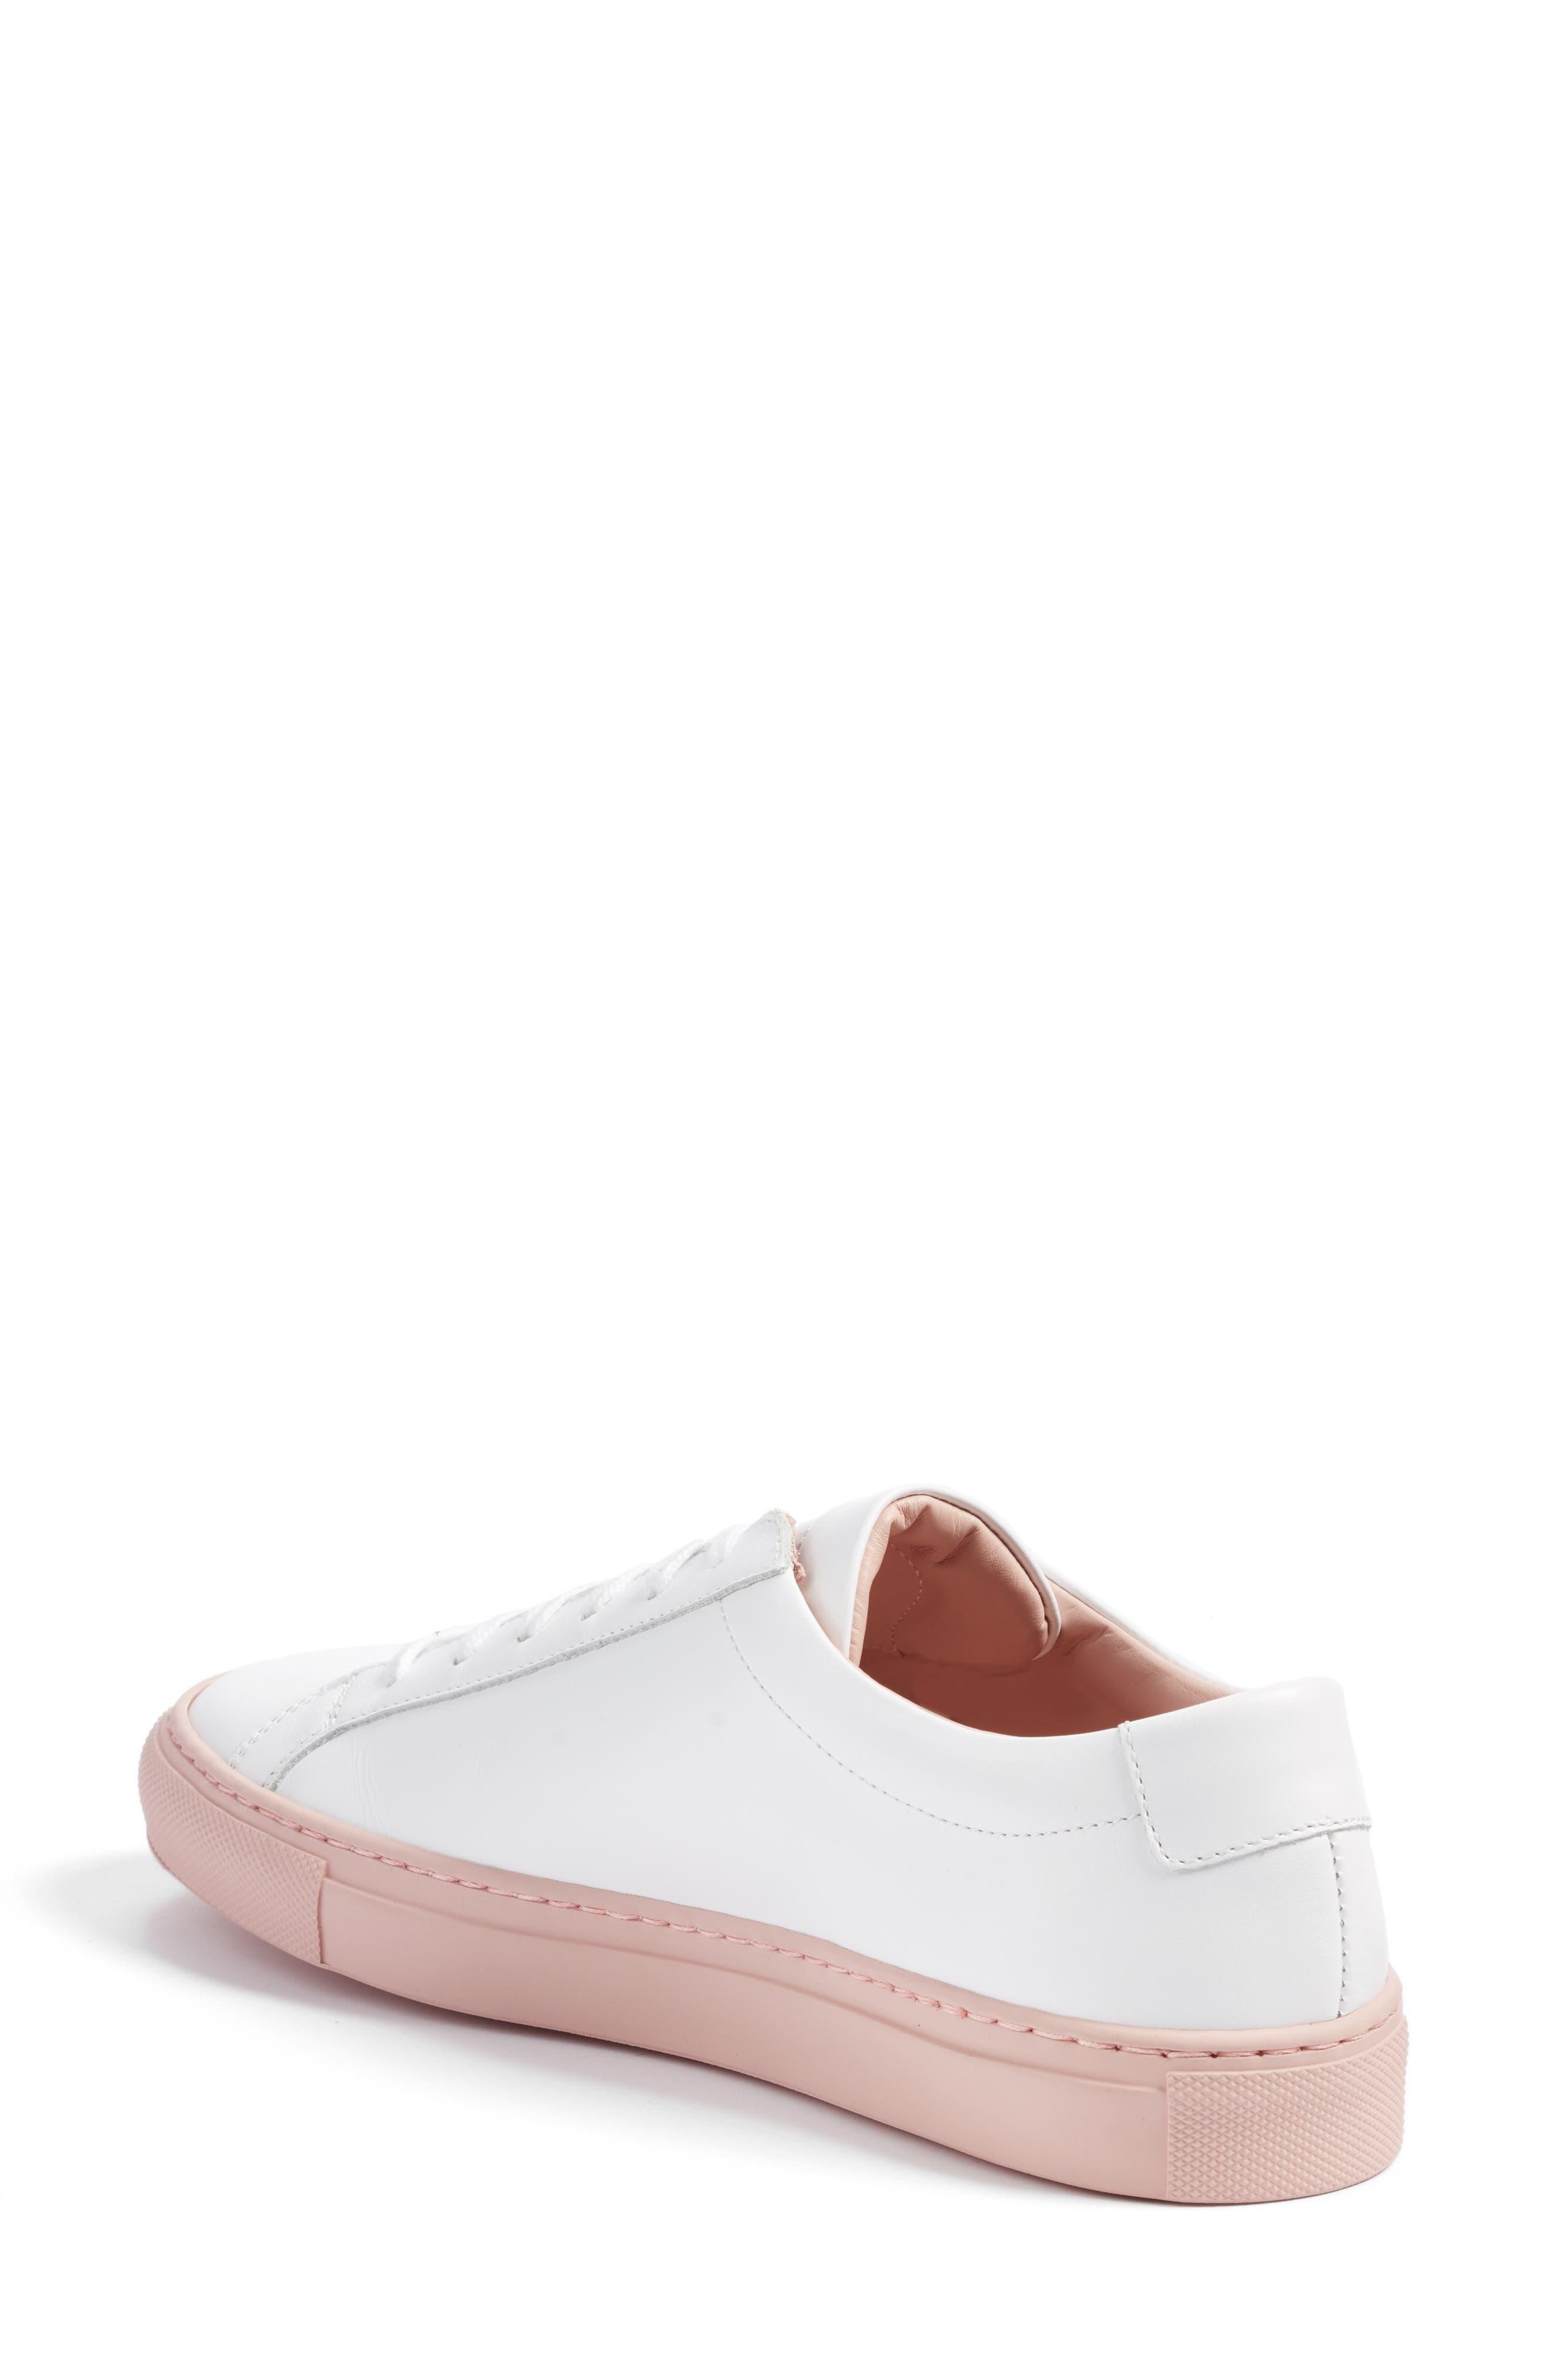 Achilles Sneaker,                             Alternate thumbnail 2, color,                             101